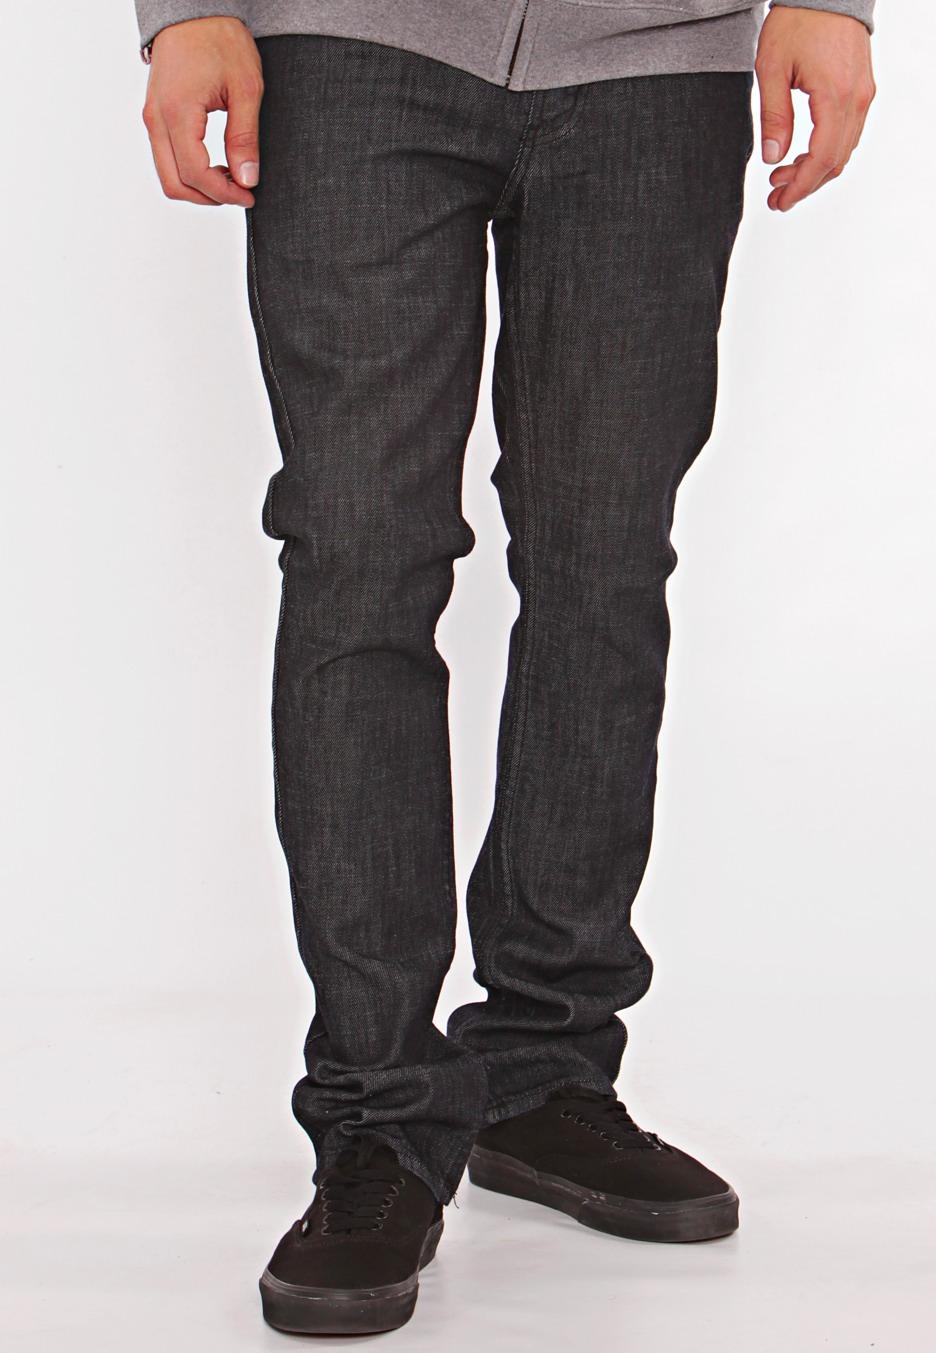 Fallen Barrio Slim Dark Indigo Jeans Impericon Com De